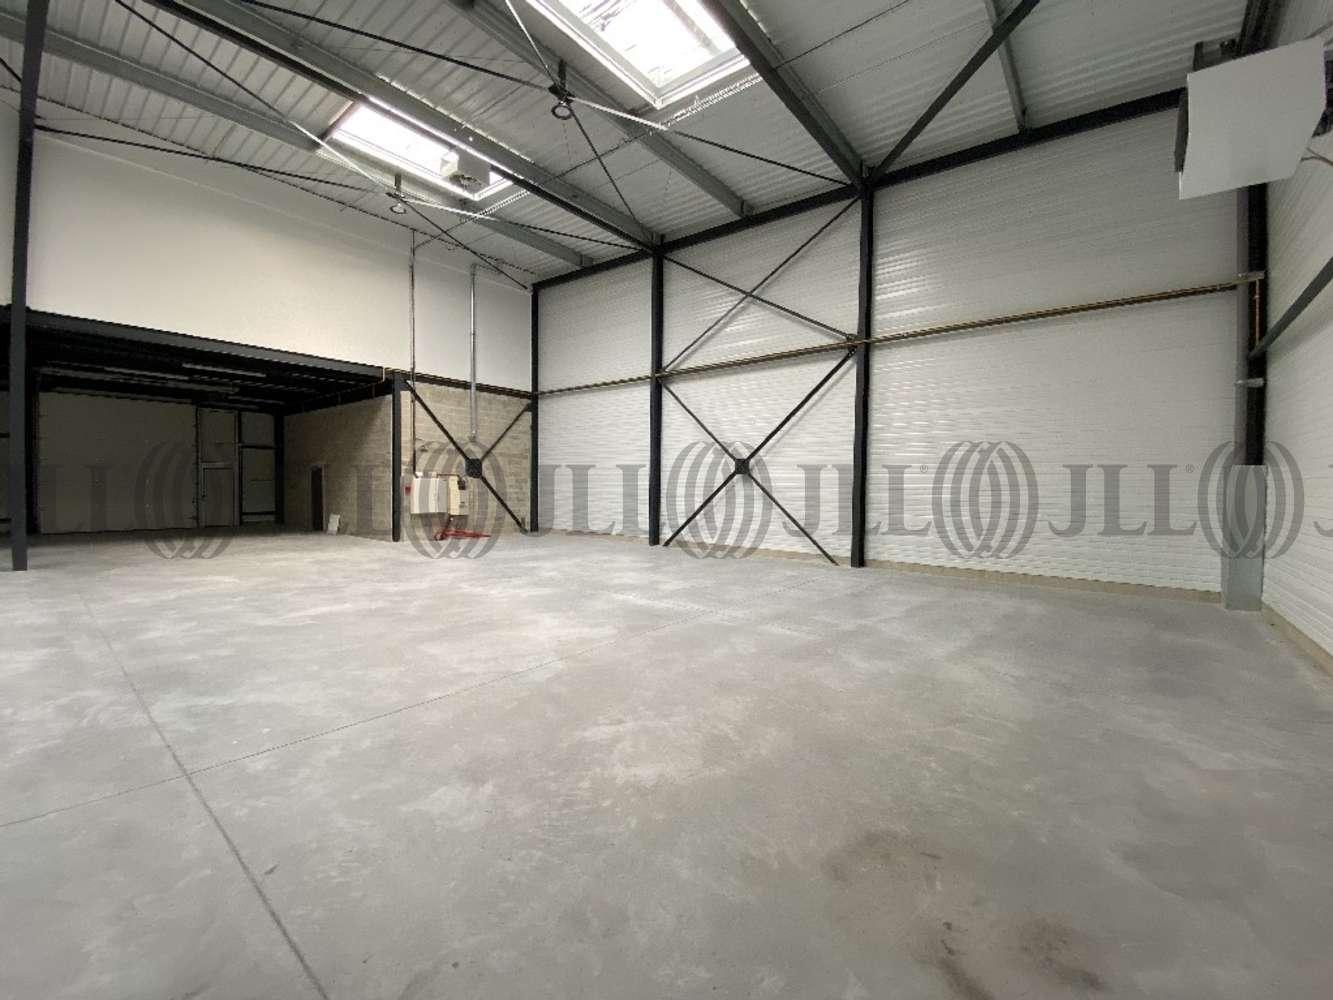 Activités/entrepôt Bailly romainvilliers, 77700